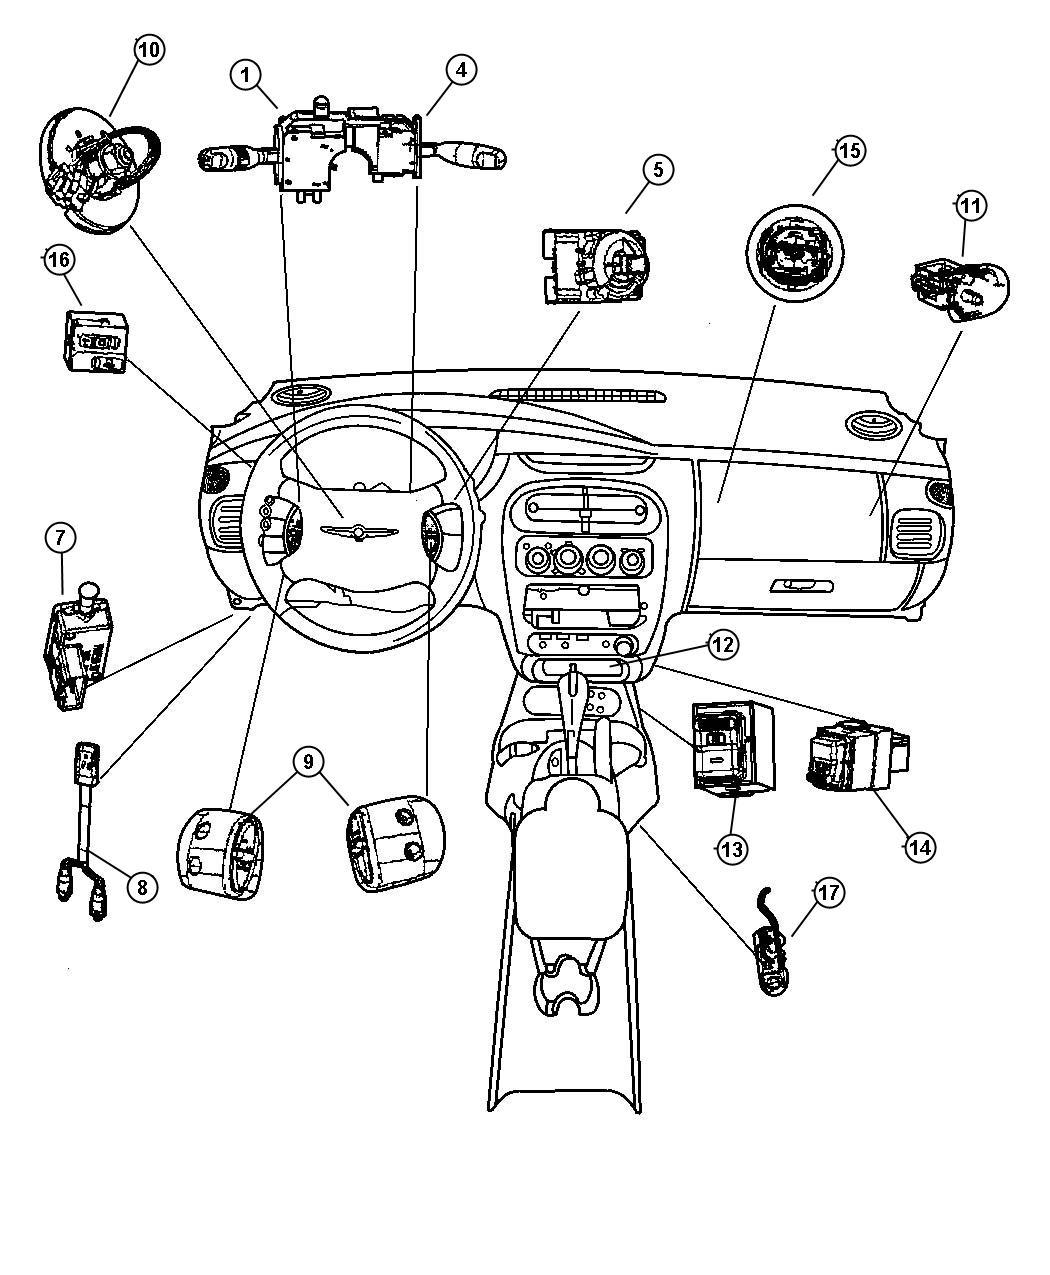 Ford Taurus Fuse Schematic